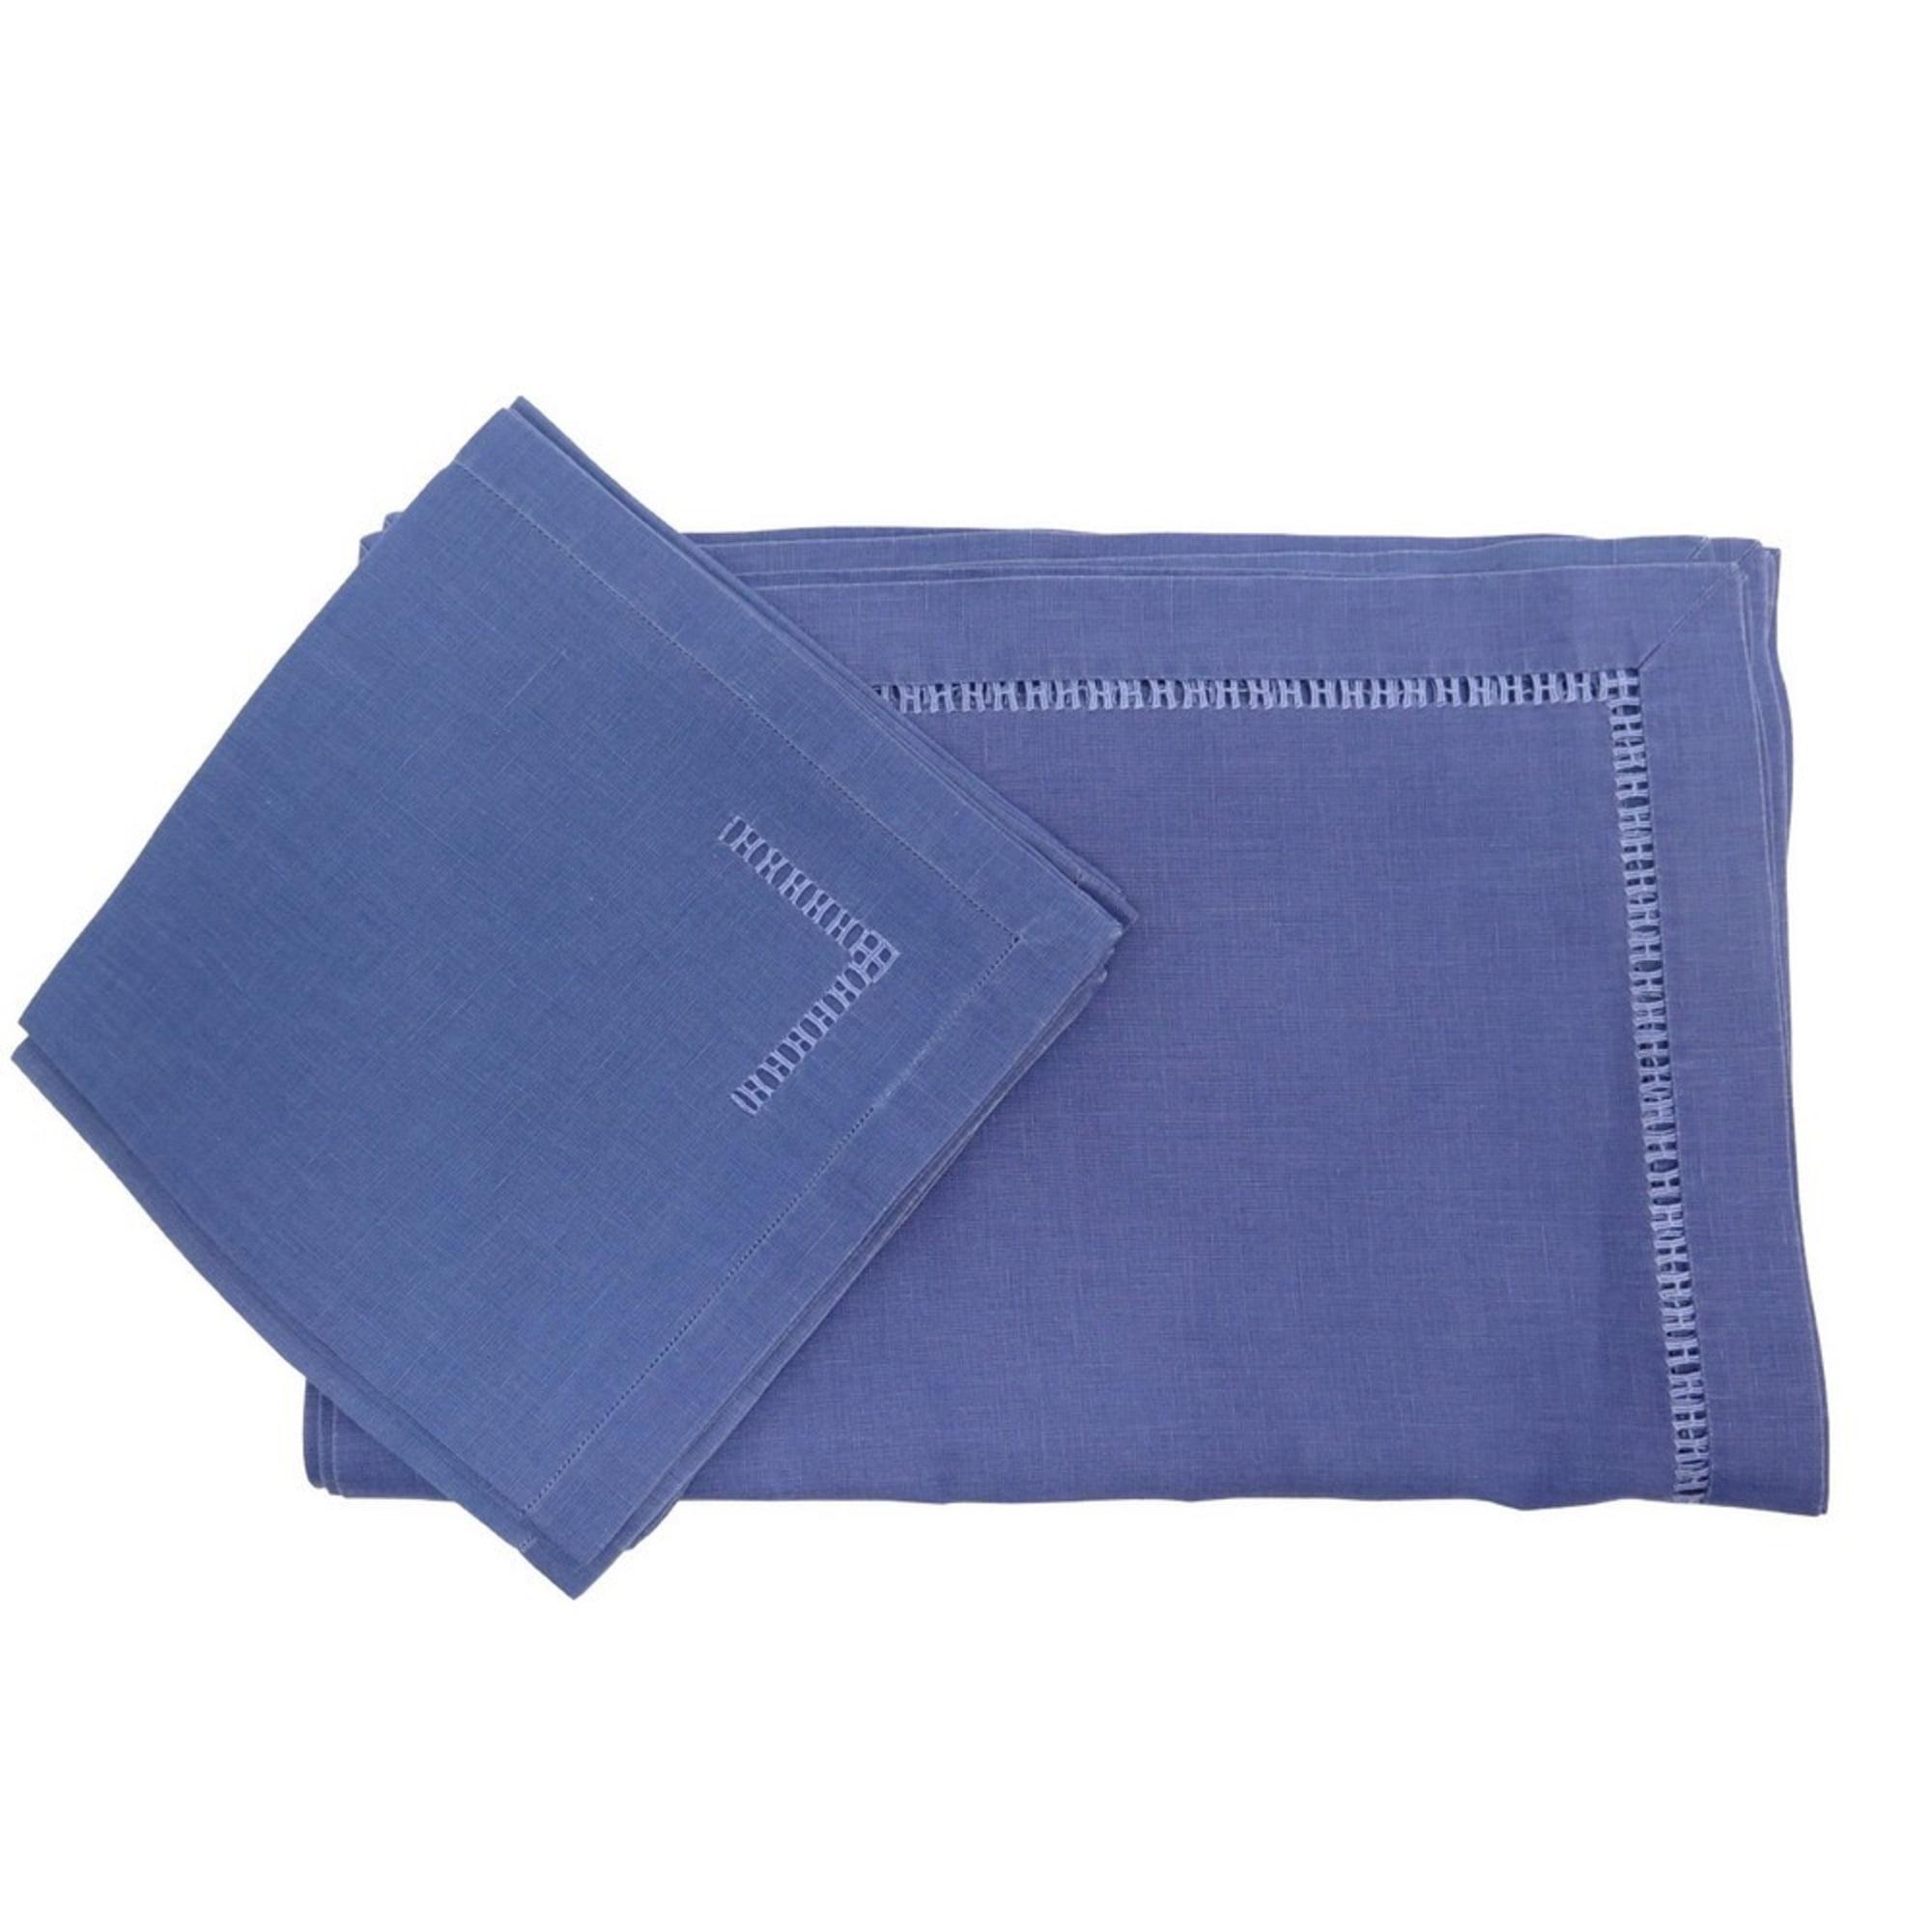 Cufflinks HERMÈS Bleu